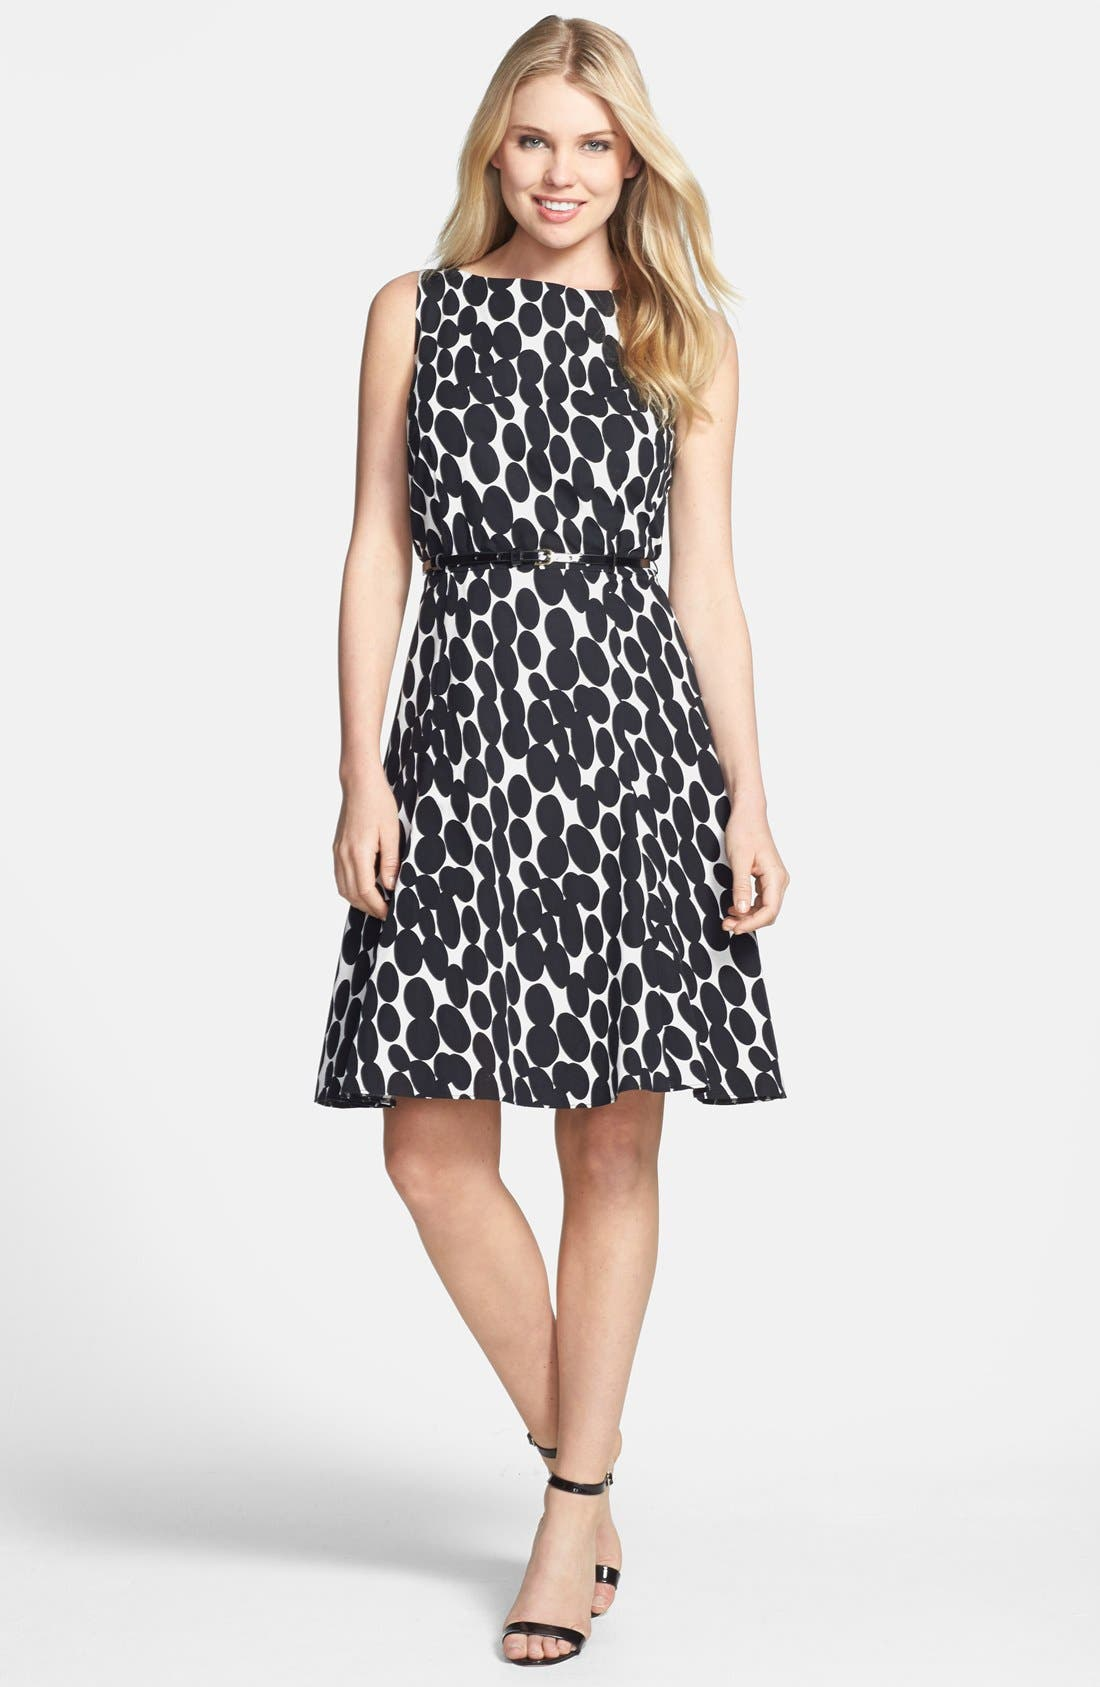 Alternate Image 1 Selected - Wallis 'Oval Spots' Fit & Flare Dress